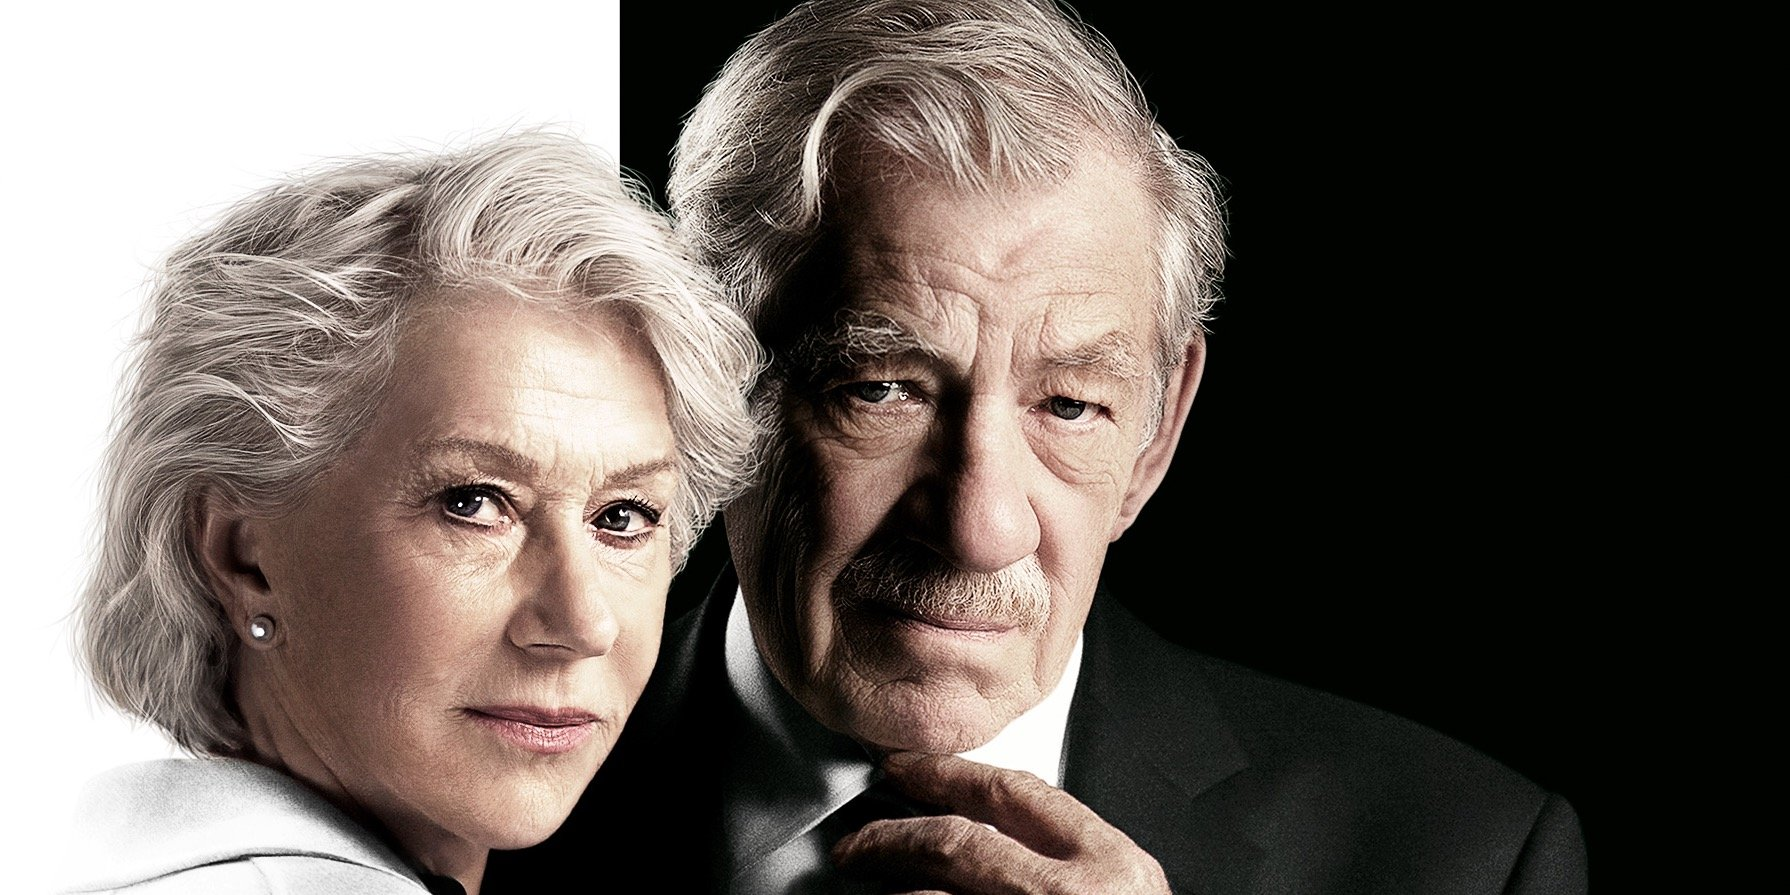 The Good Liar Review: Mirren and McKellen shine in this slick thriller